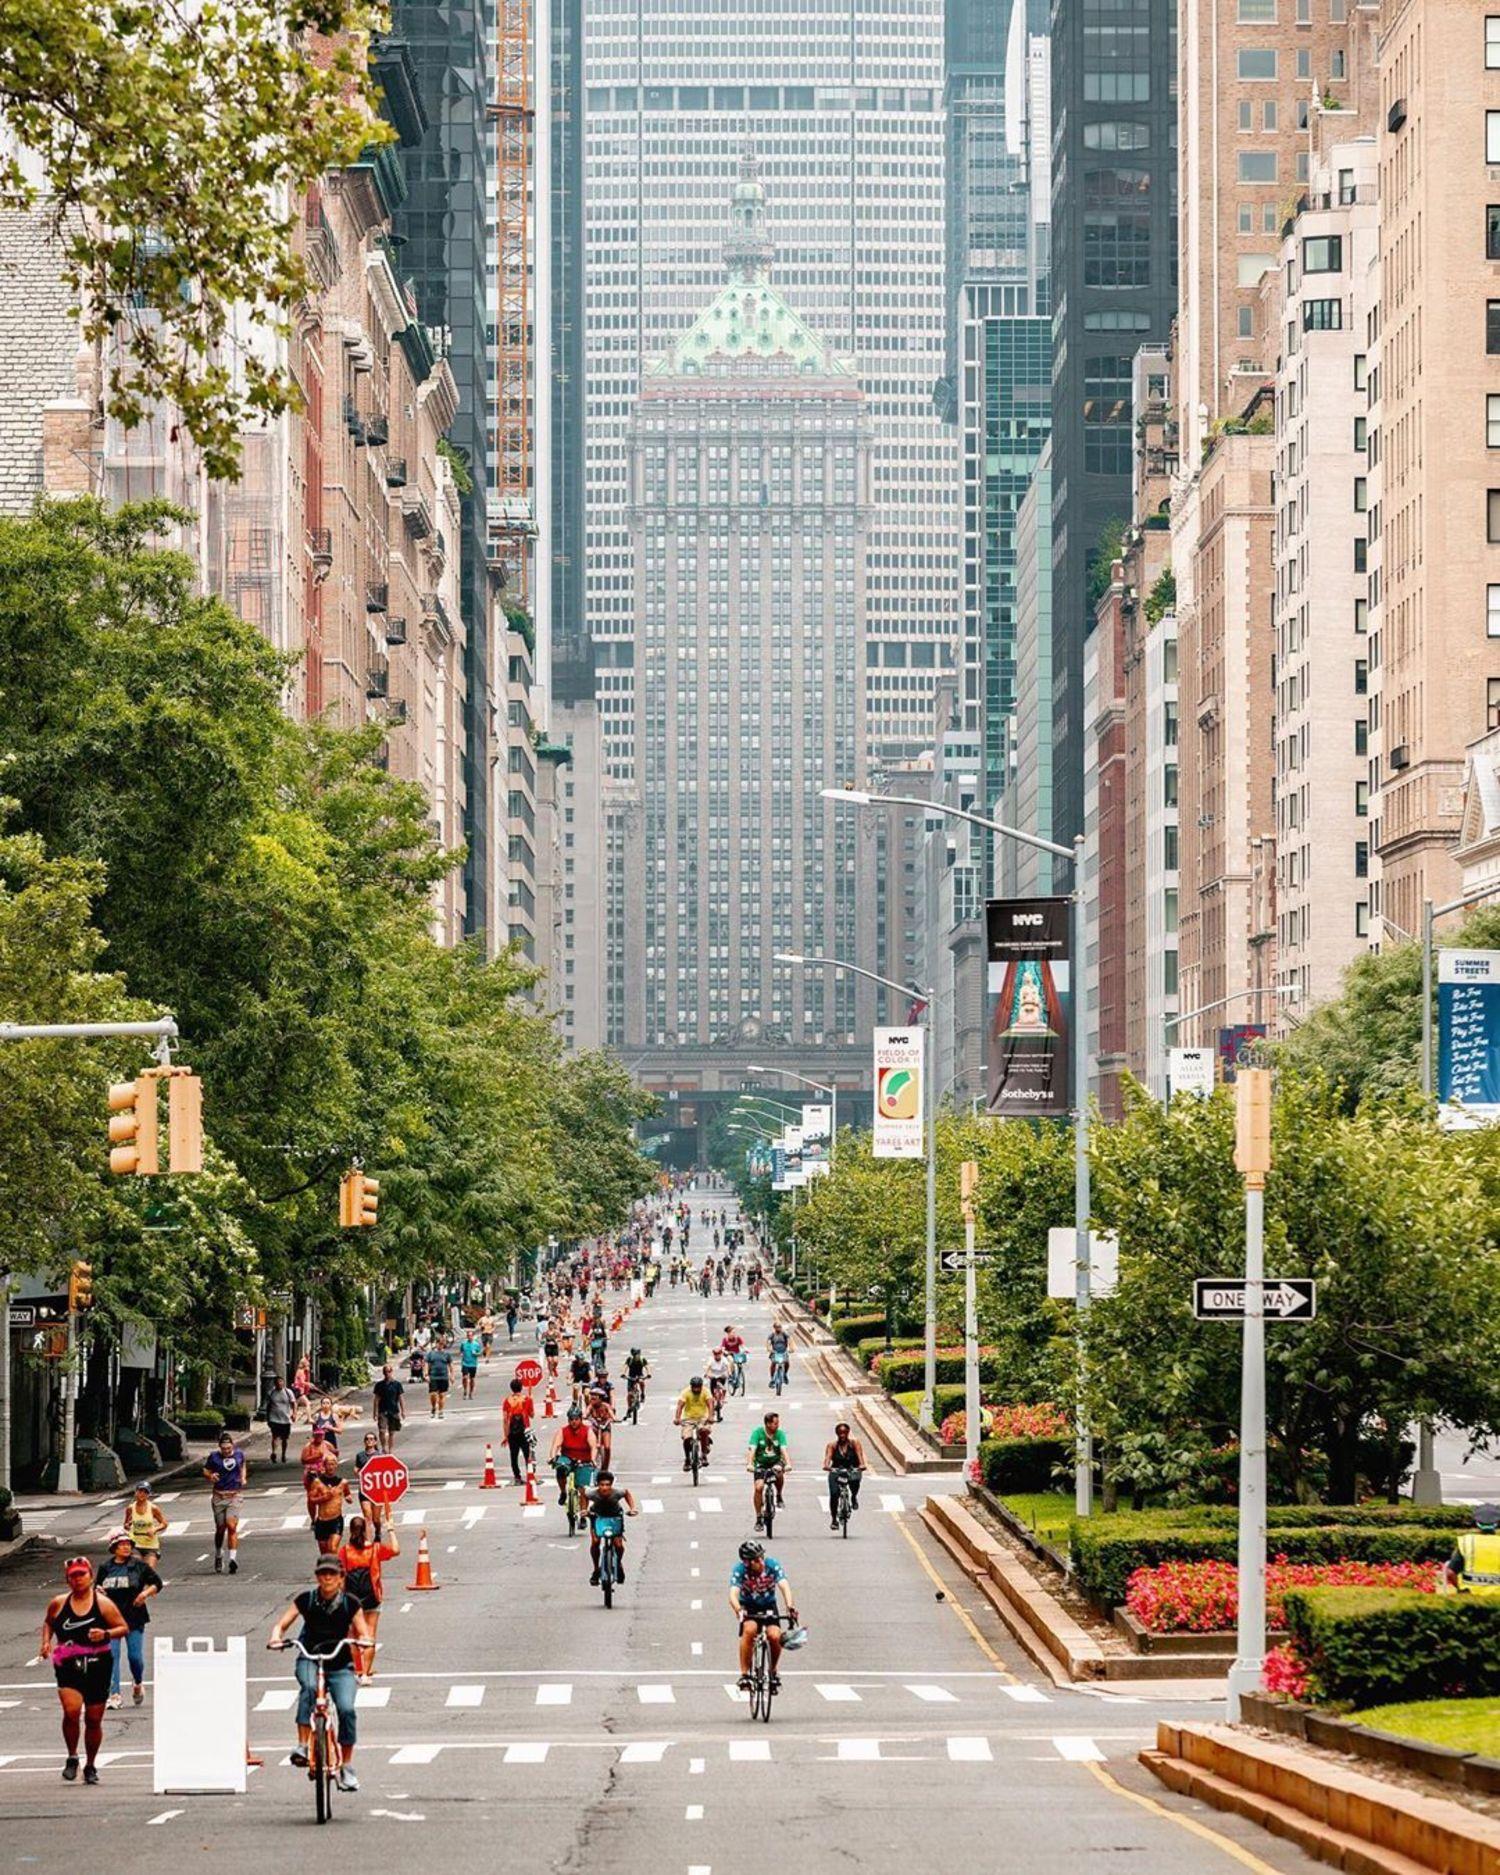 Summer Streets, Park Avenue, Midtown, Manhattan